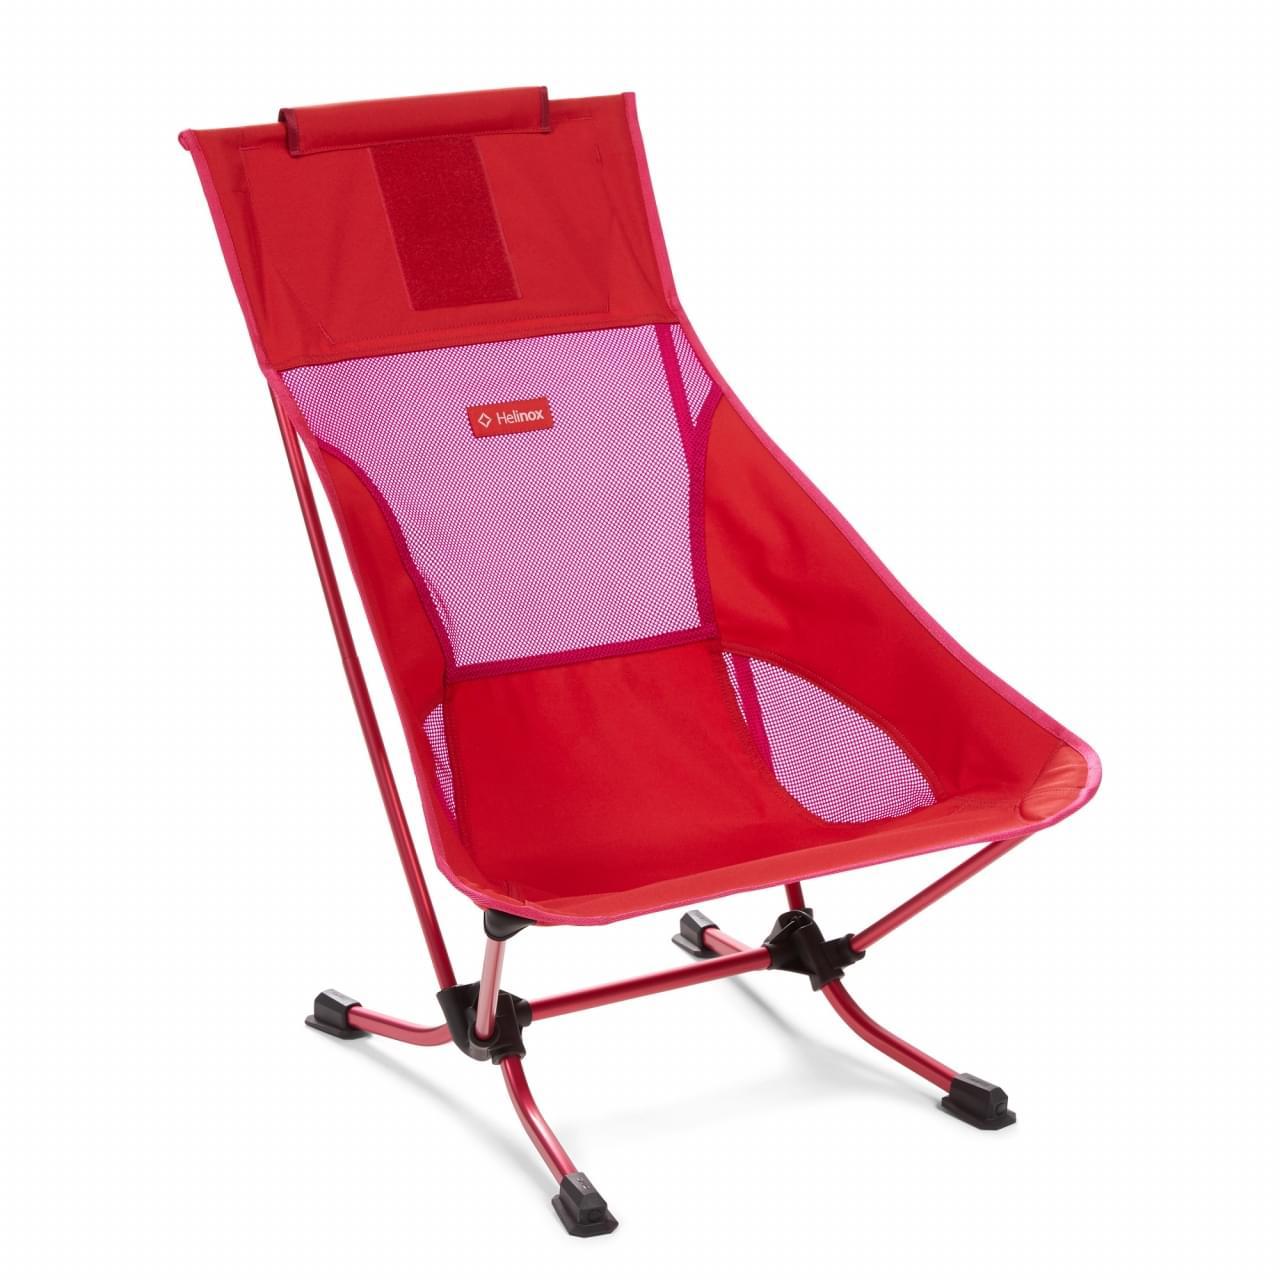 Helinox Beach Chair Block Lichtgewicht Stoel - Rood